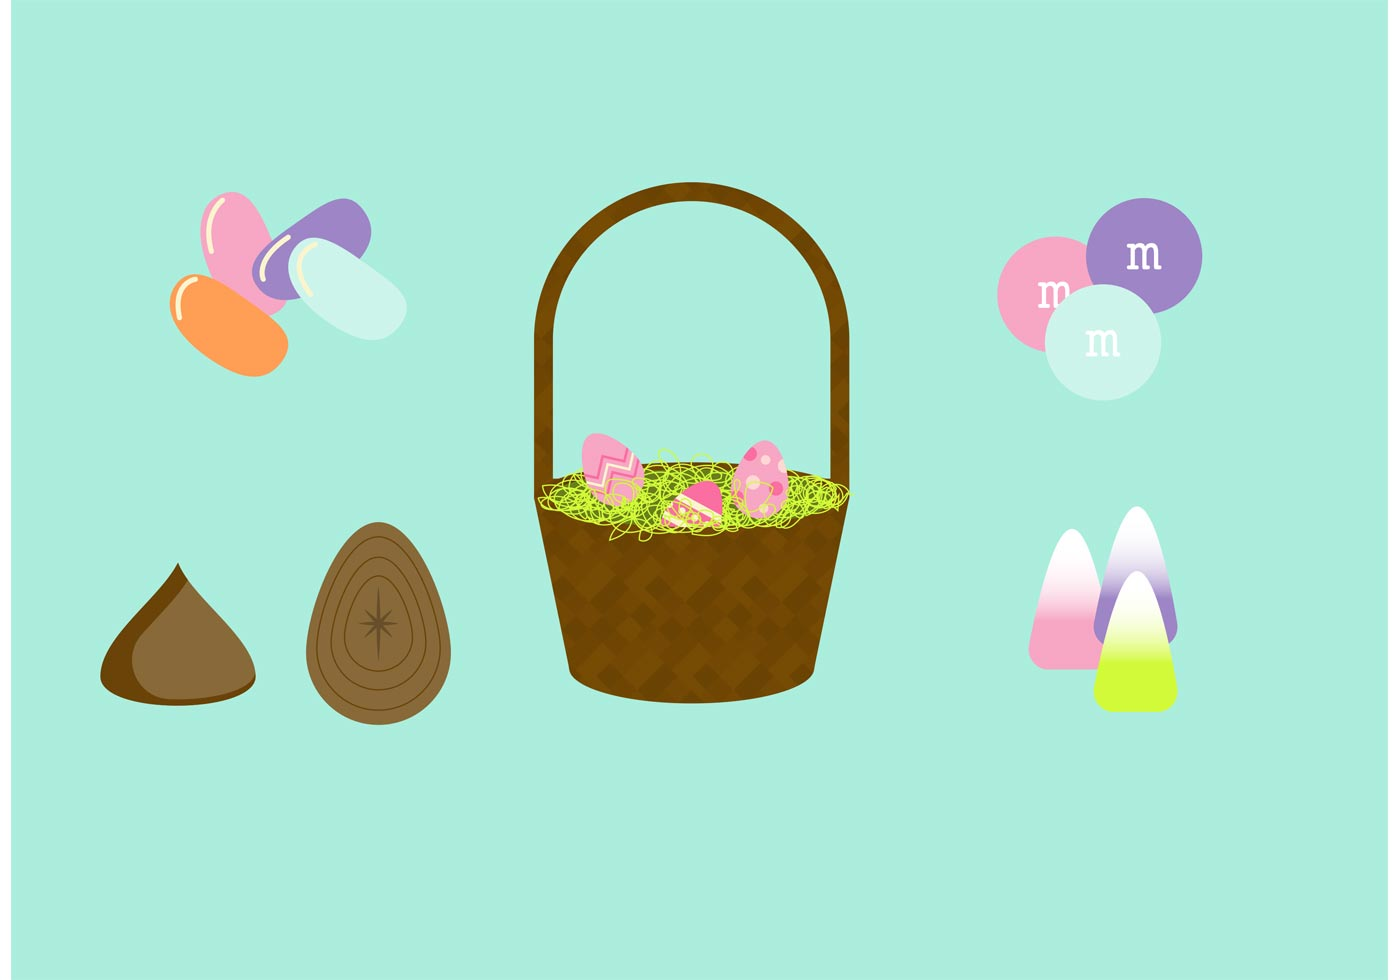 Cute Candy Corn Wallpaper Easter Basket Vector Set Download Free Vector Art Stock